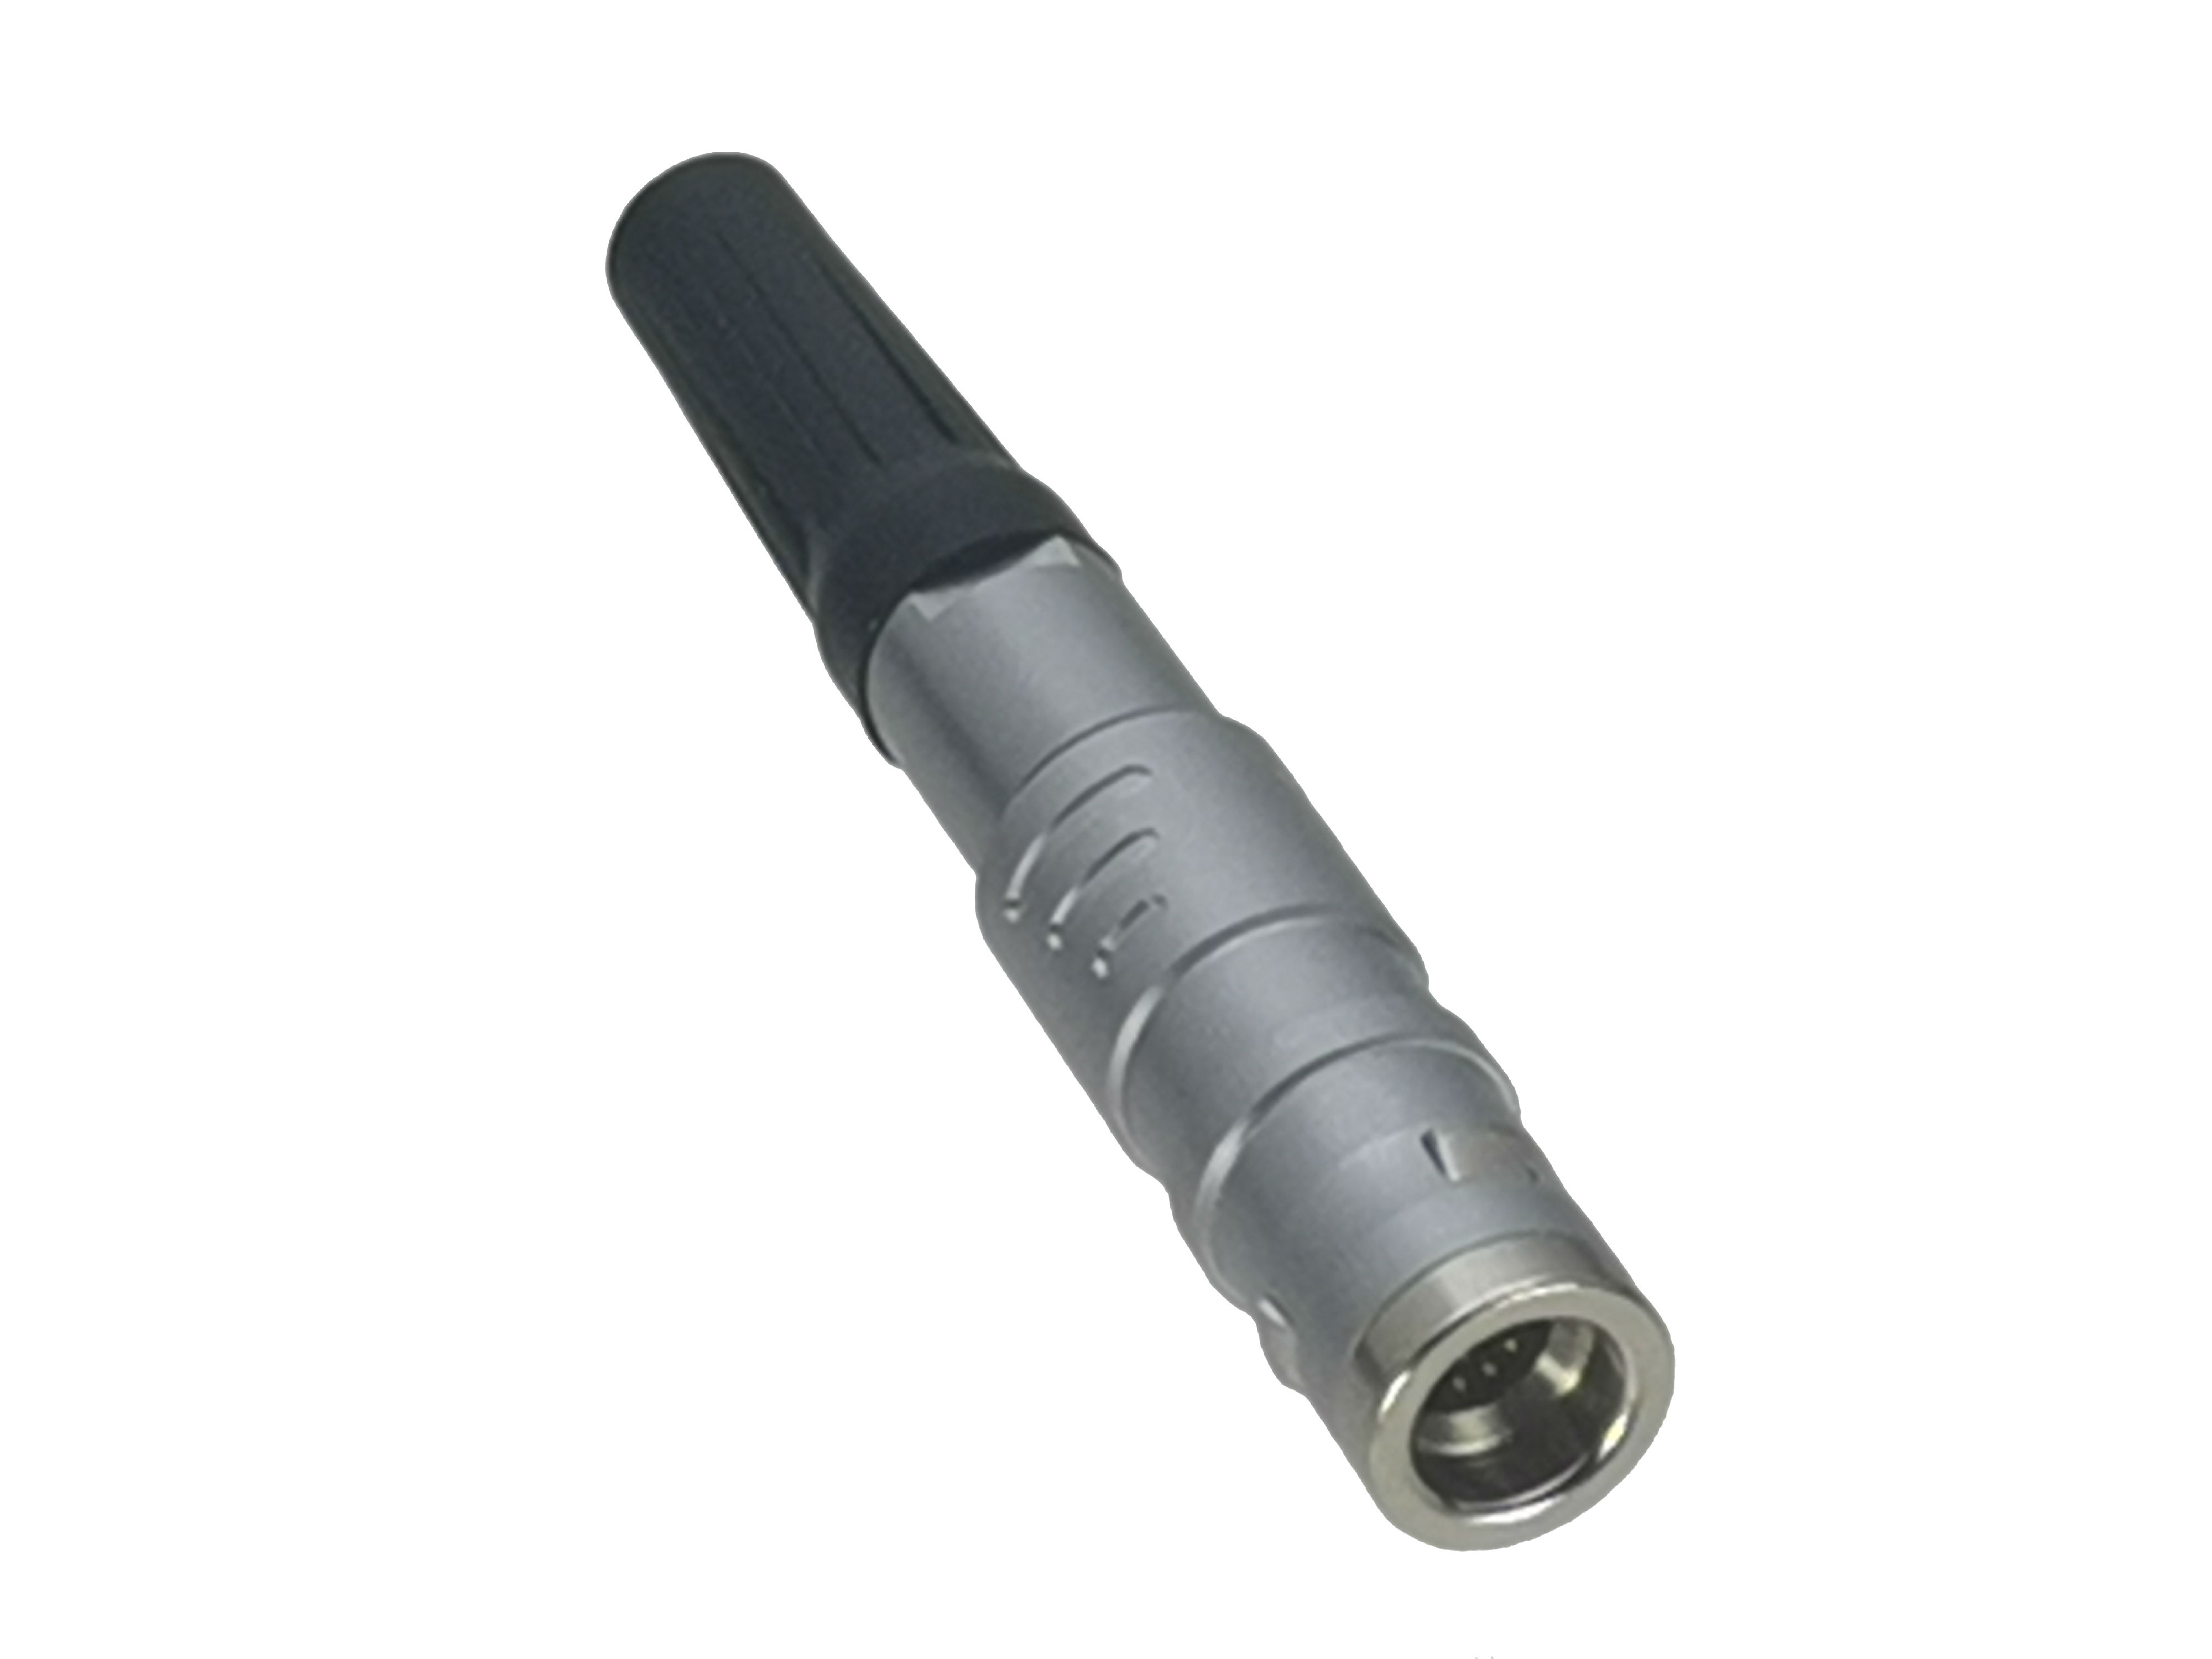 FGG 1K M16 16 pin Plug Quick Auto Waterproof Connector push pull self locking aviation plug|Connectors| |  - title=